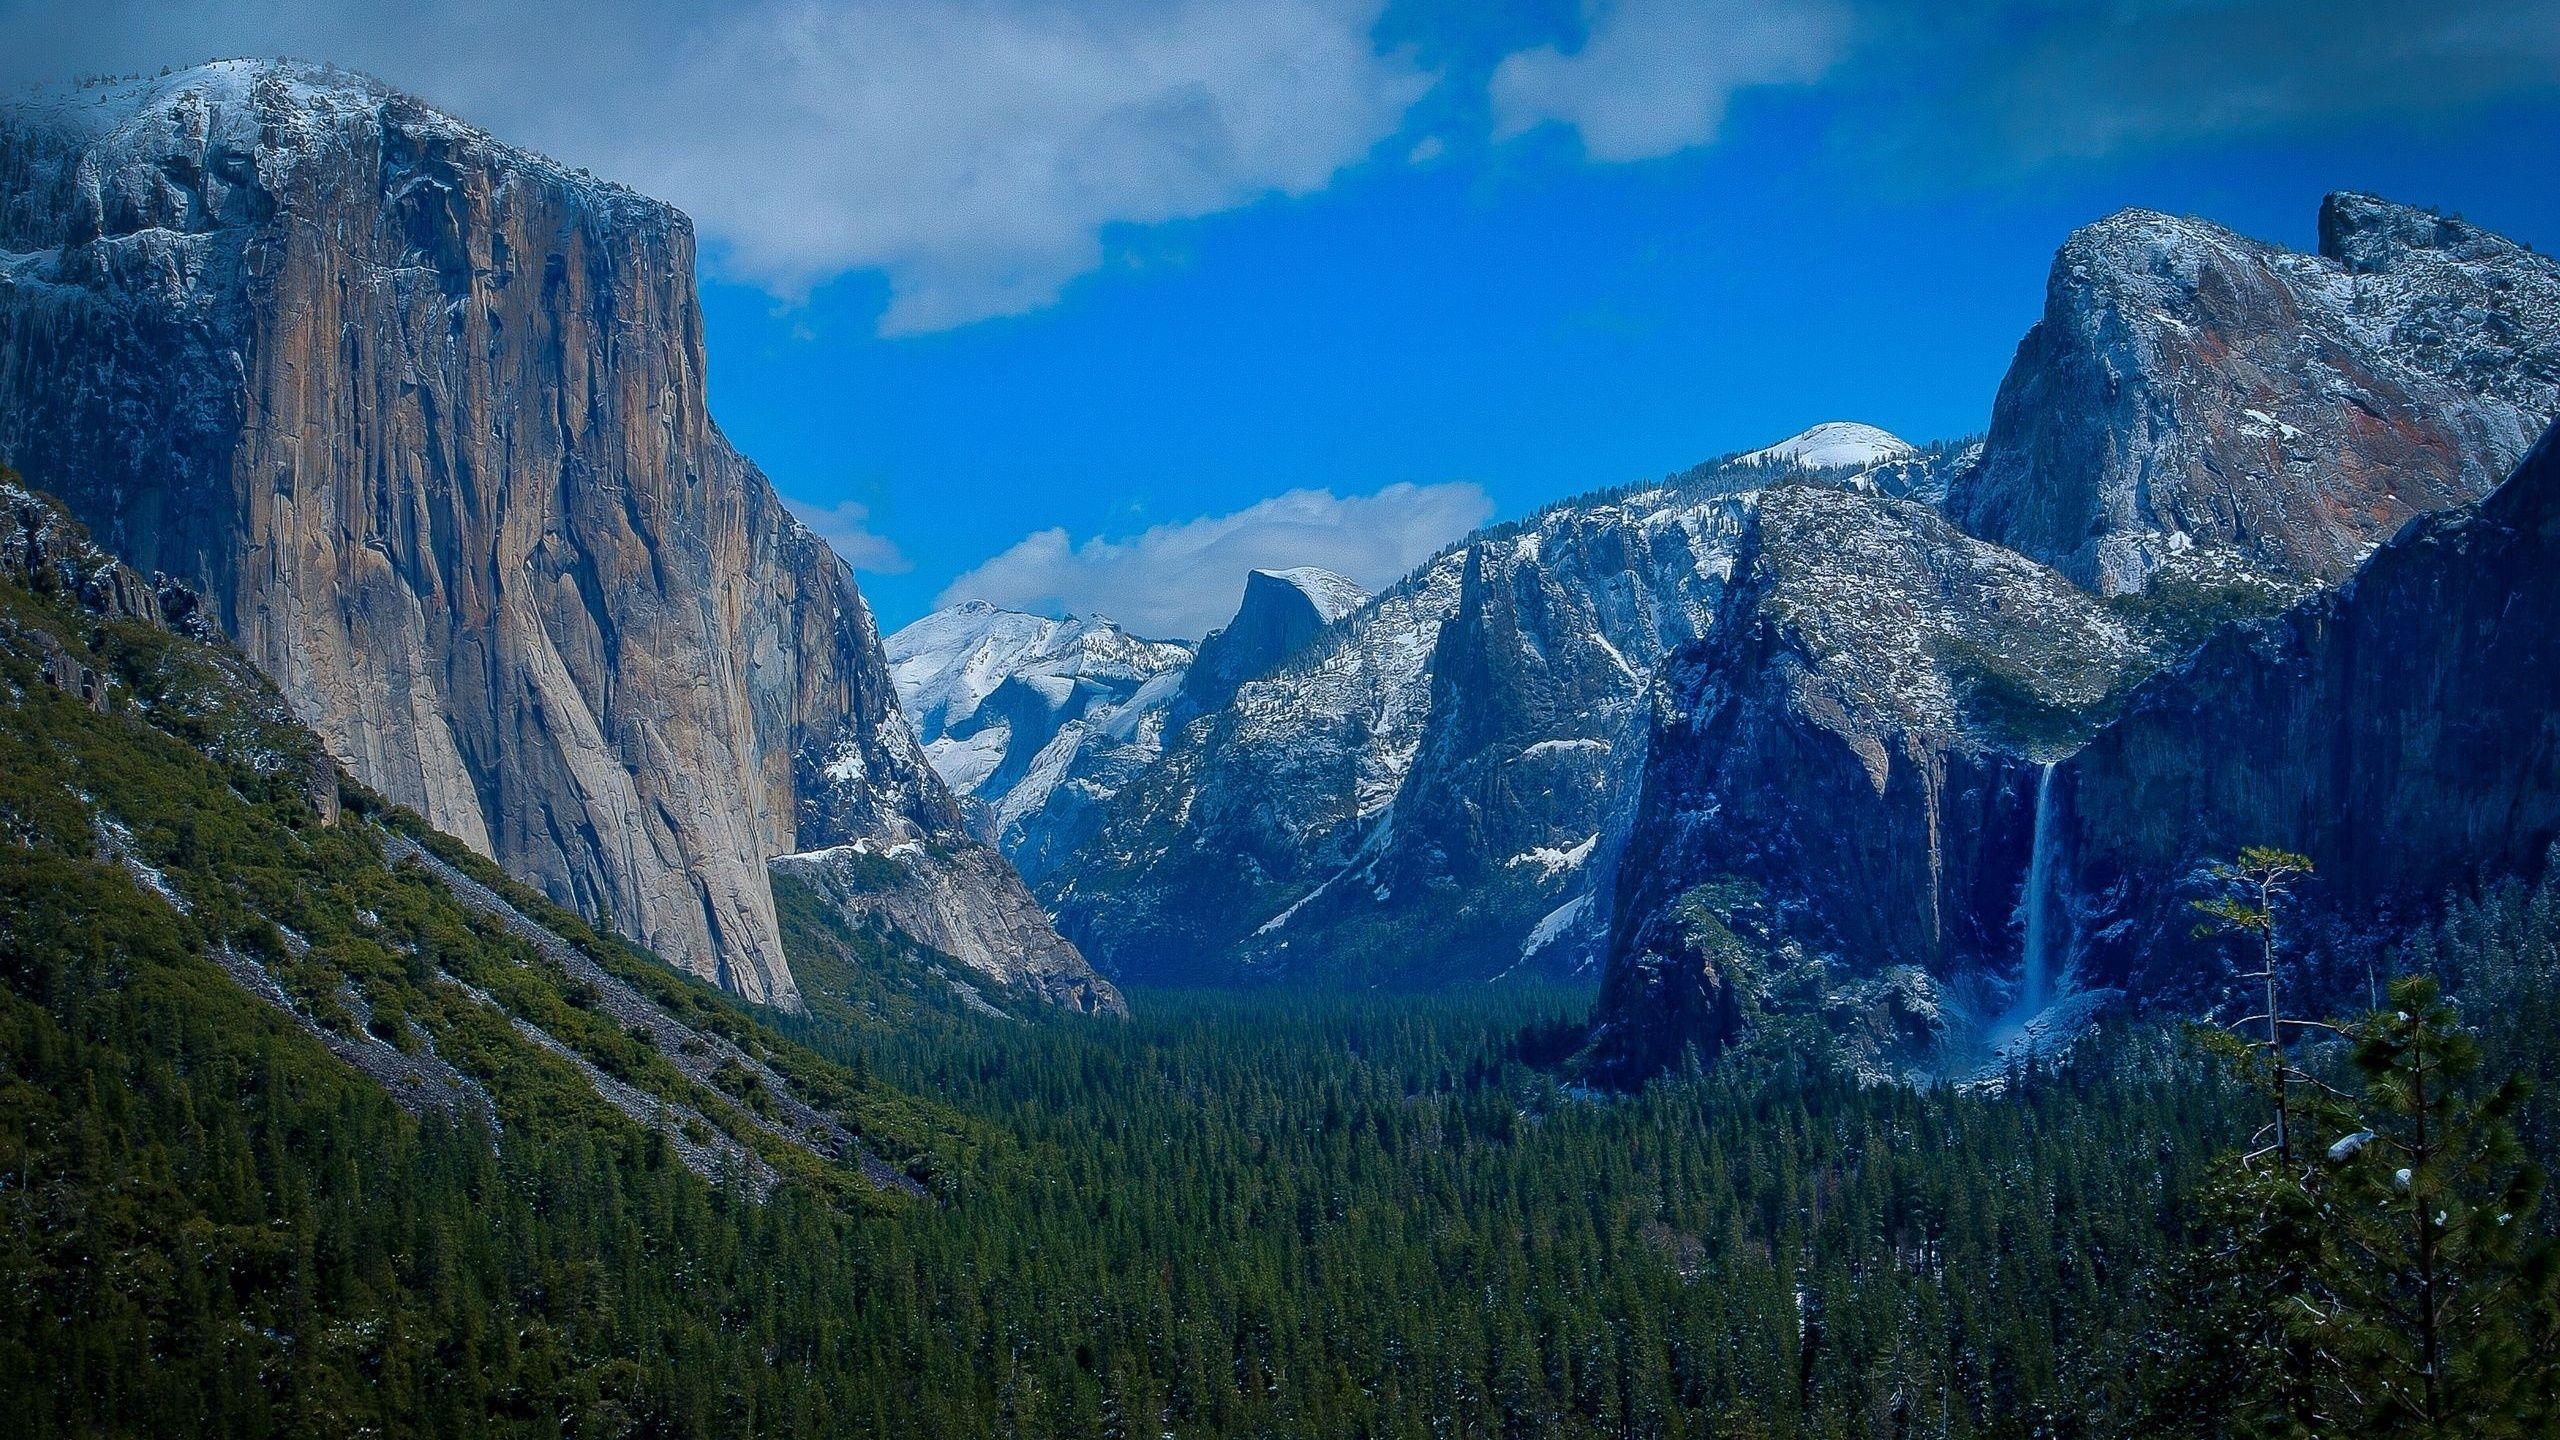 Background image yosemite - Jpg 2560x1440 Yosemite National Park Desktop Background